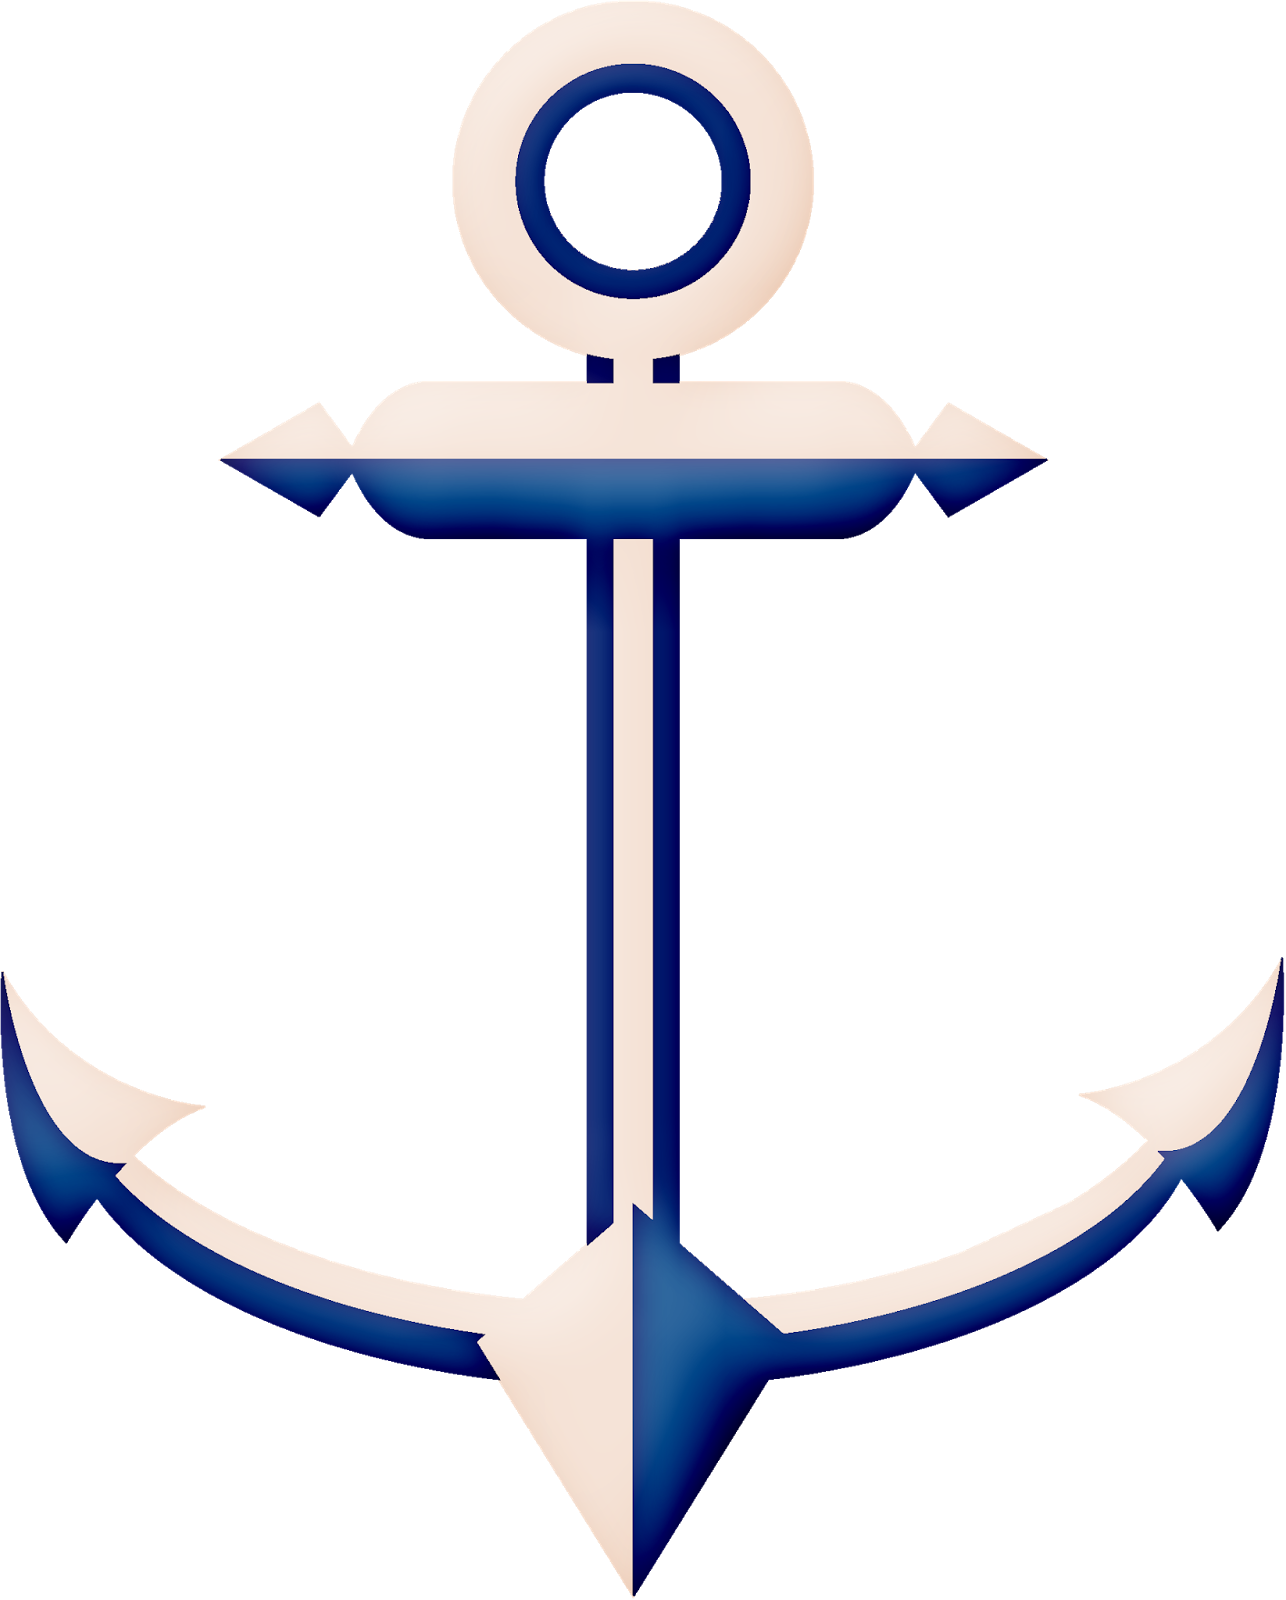 Passatempo da ana imagens. Clipart anchor birthday